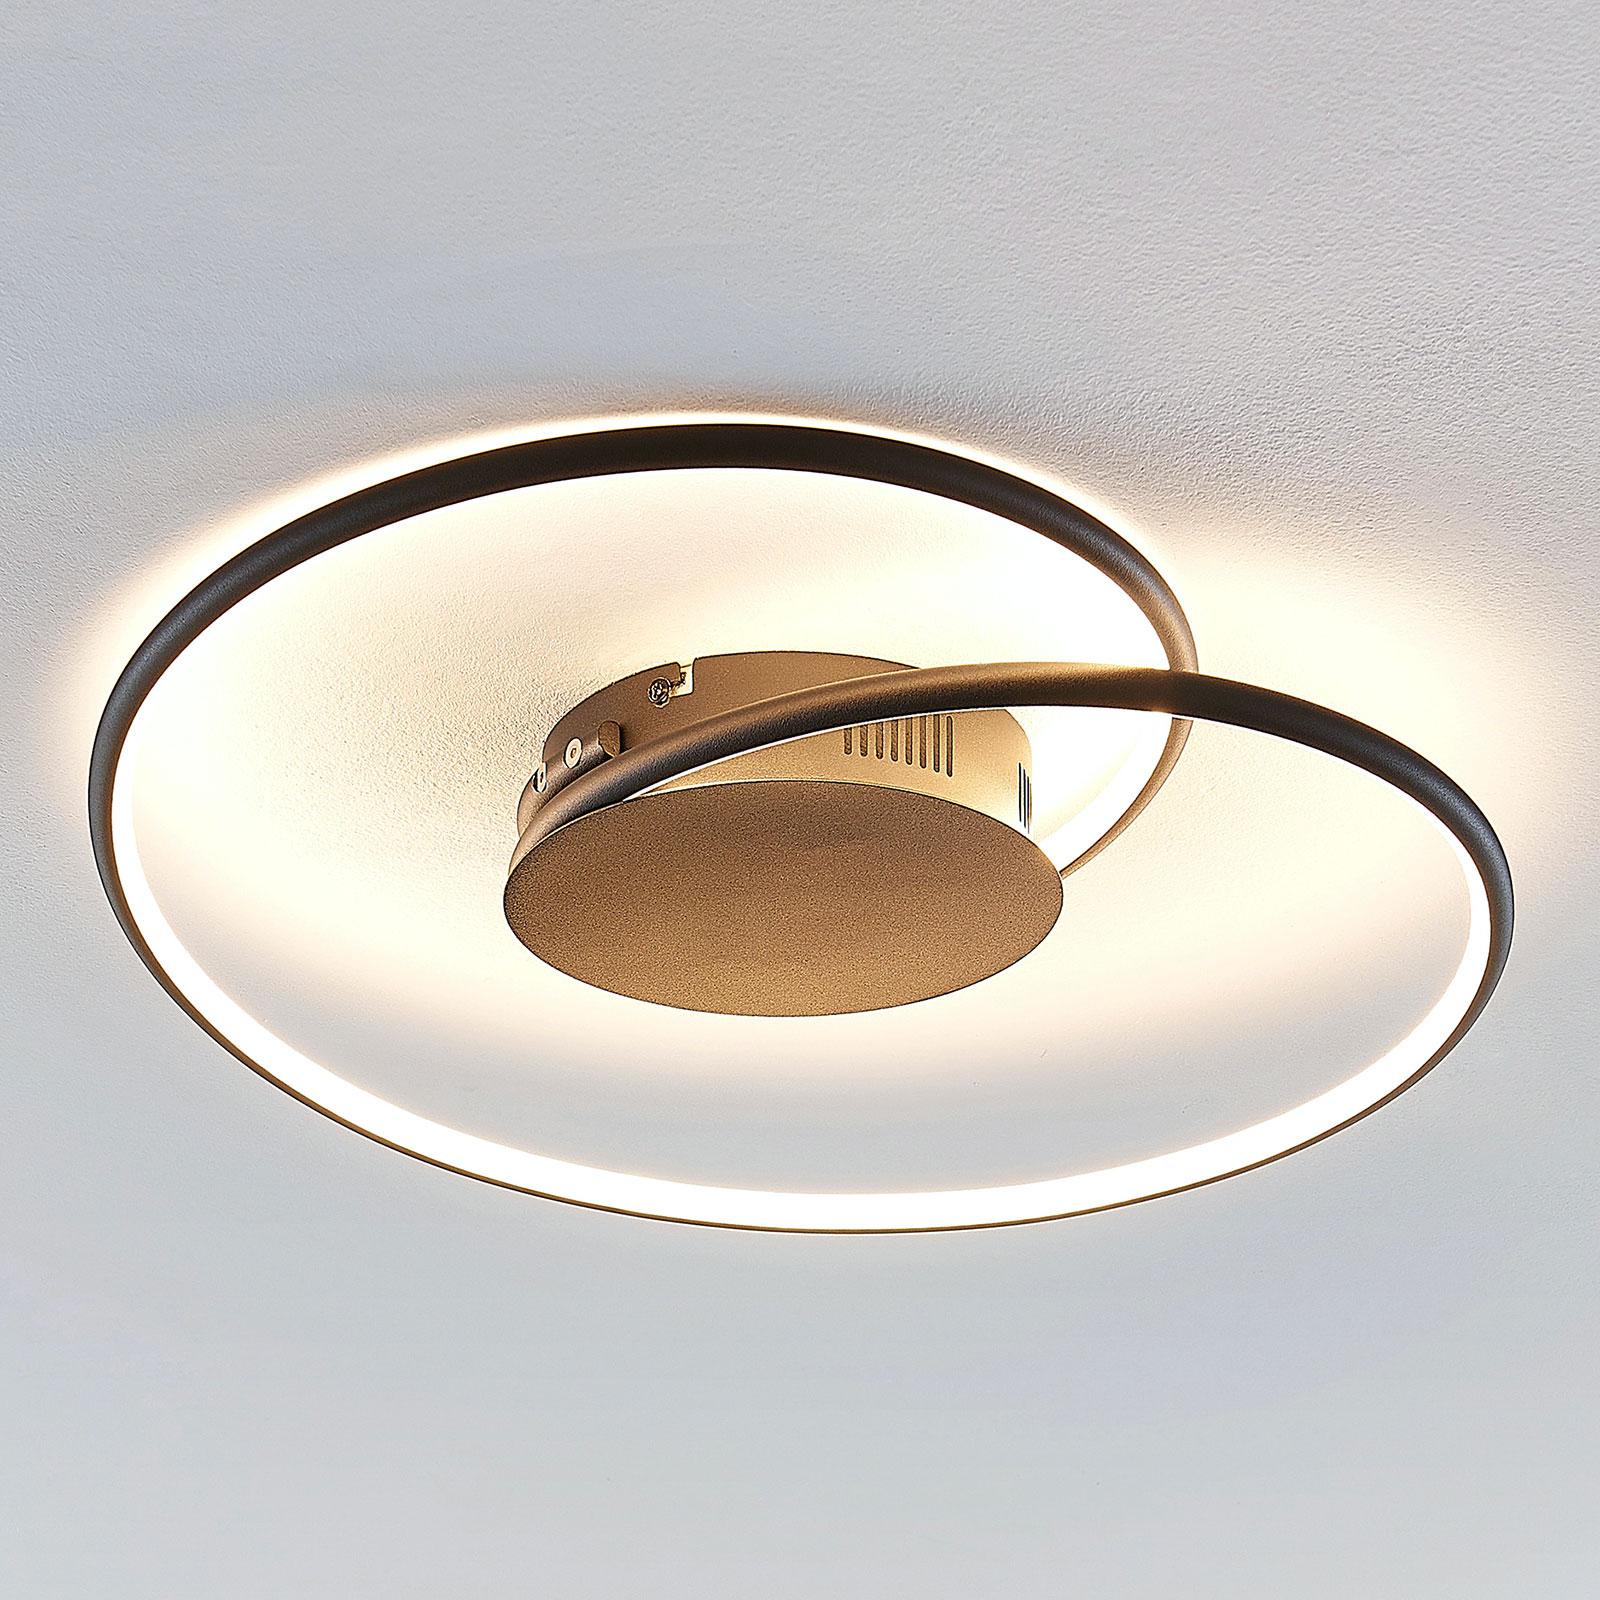 Lindby Joline lampa sufitowa LED, czarna 45 cm